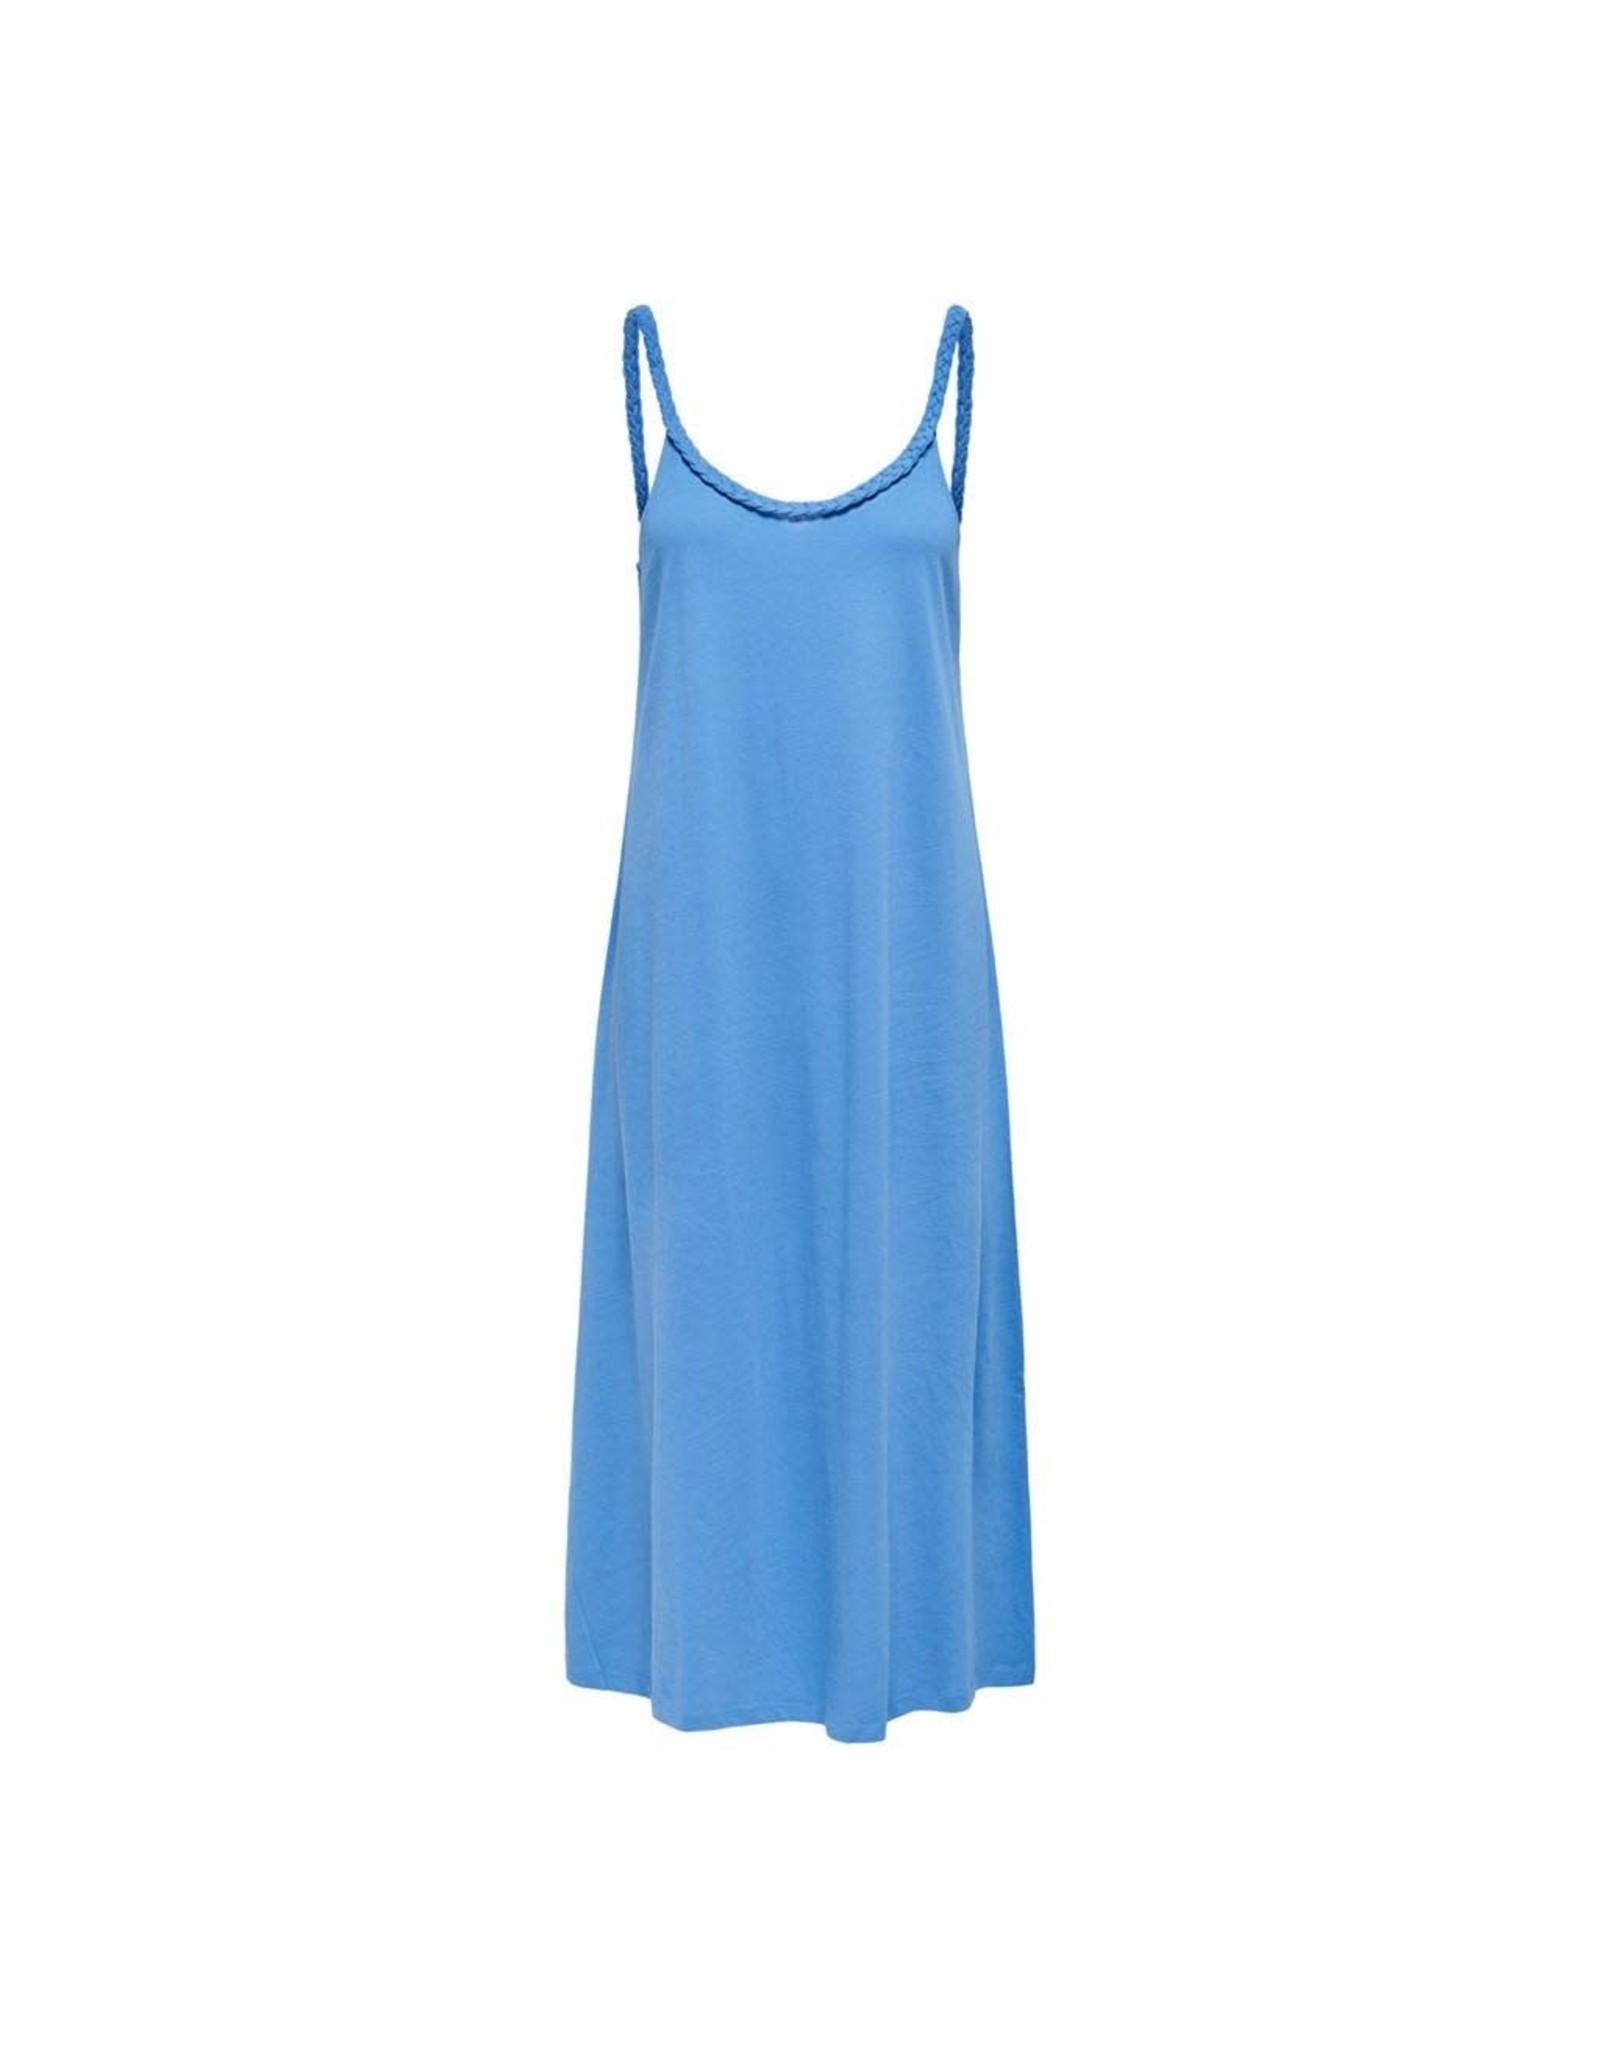 Jacqueline De Yong Jurk flet life strap blauw